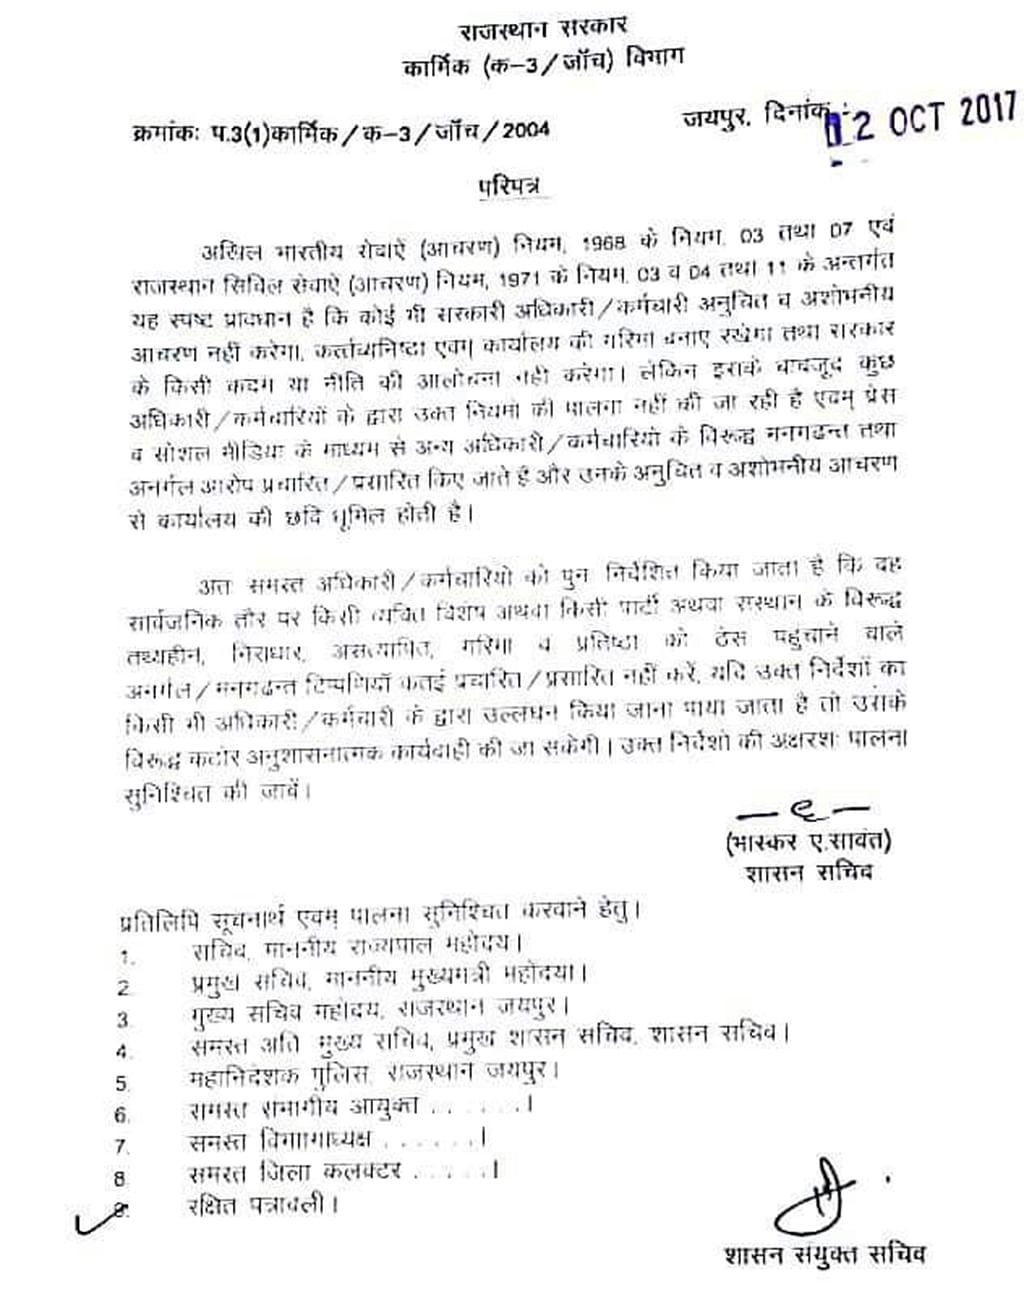 Rajasthan circular: pay for criticising govt on social media